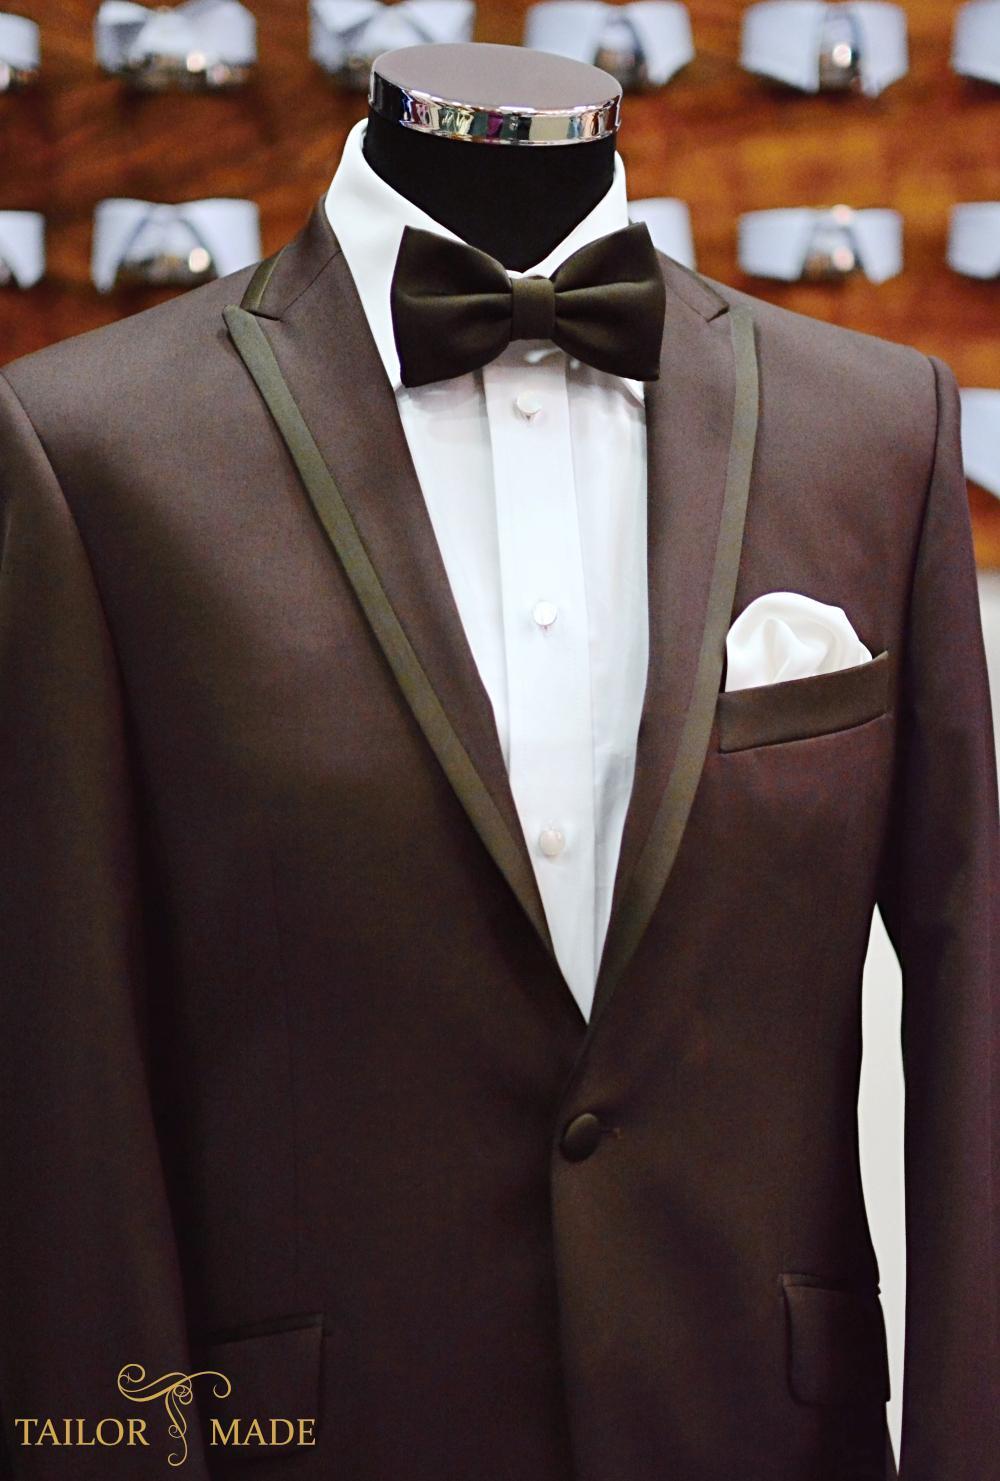 tailormade - Obrázok č. 8